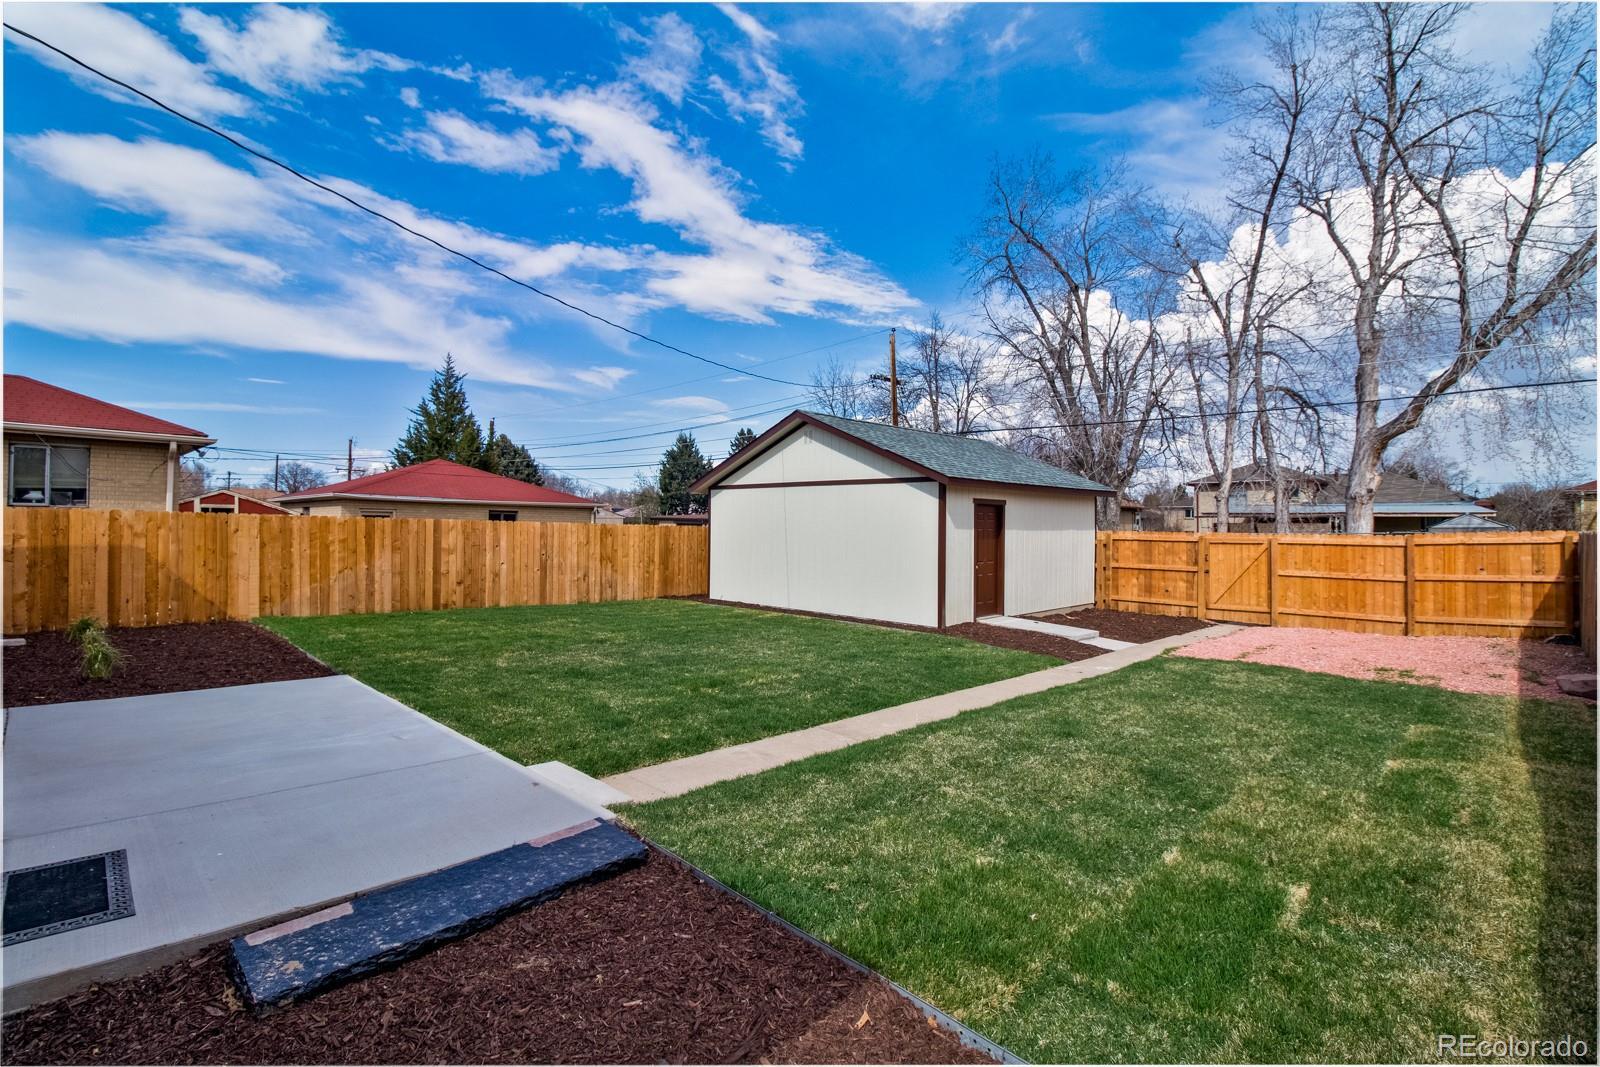 MLS# 8299867 - 19 - 3536 N Dahlia Street, Denver, CO 80207